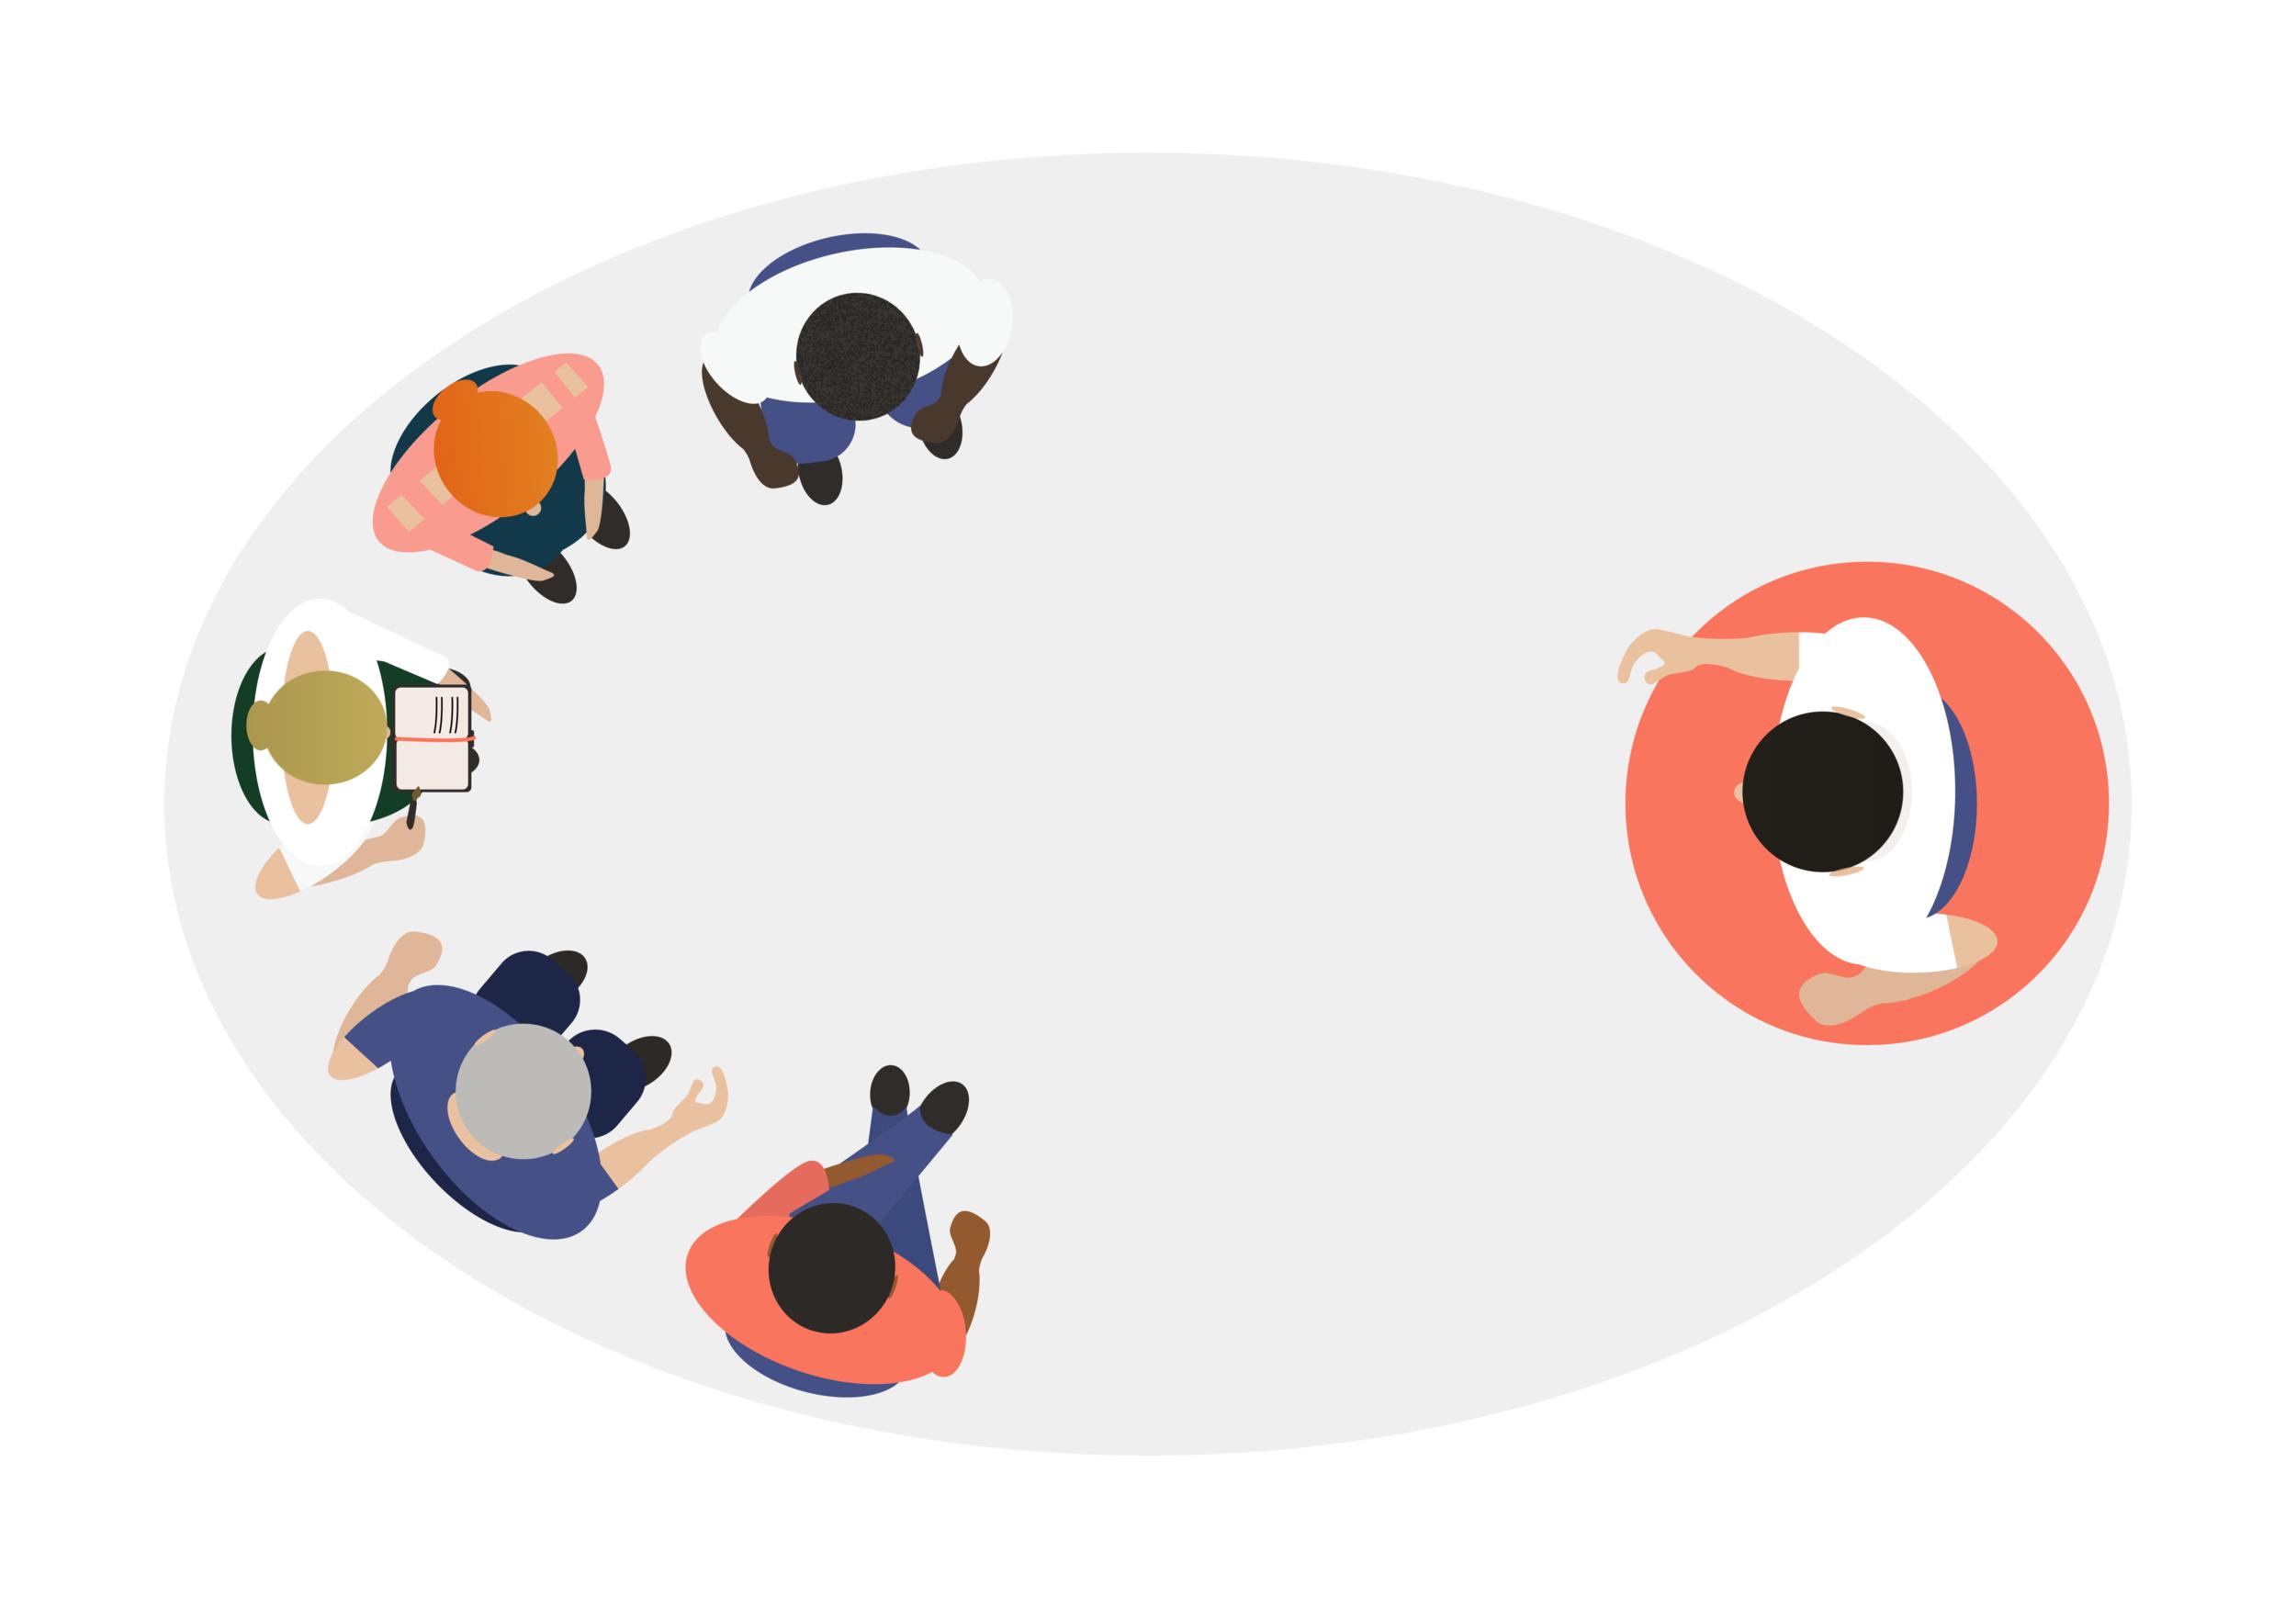 the Purposeful leader - Branding & Illustration